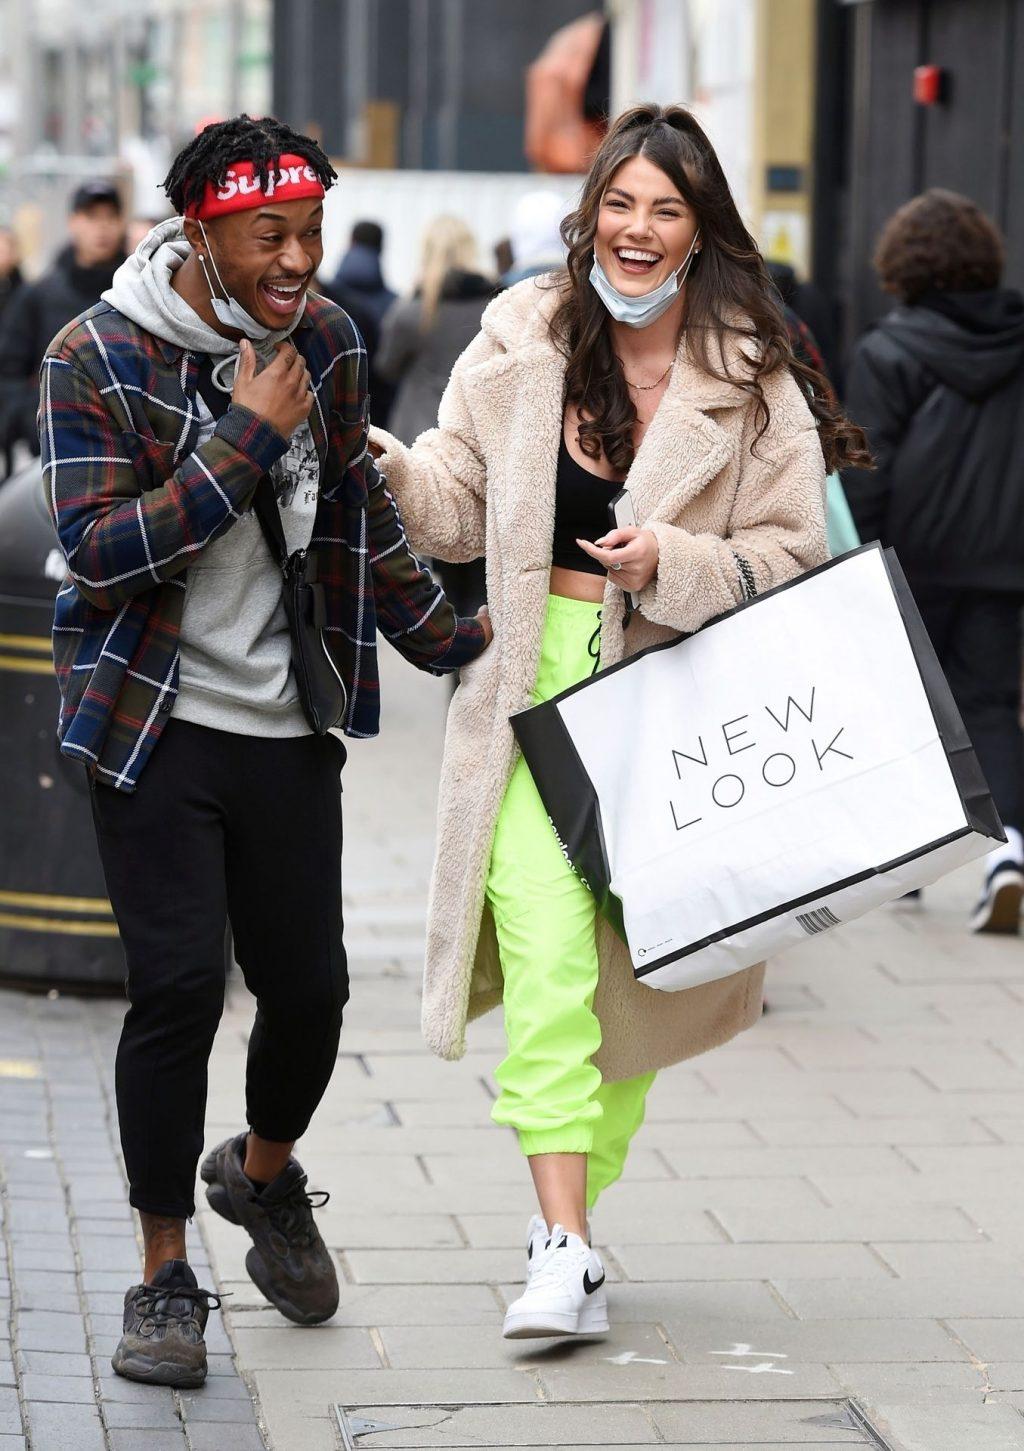 Rebecca Gormley & Biggs Chris Are Seen Kissing for the Cameras in London (22 Photos)